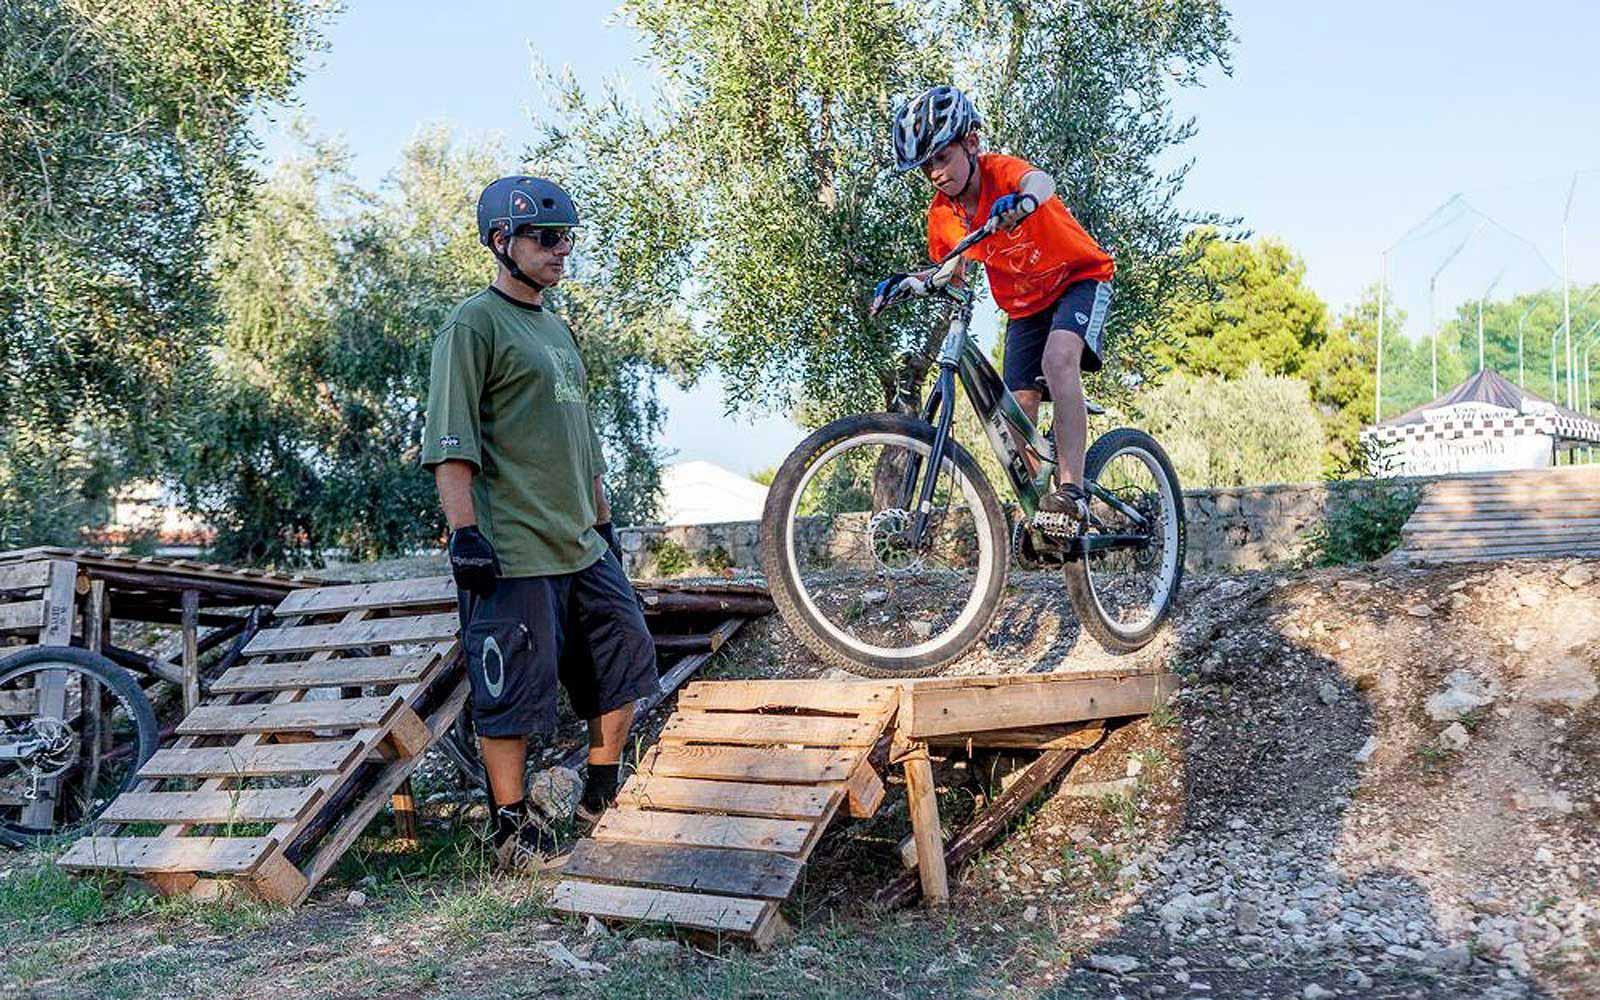 Mountain bikes at the Gattarella Resort